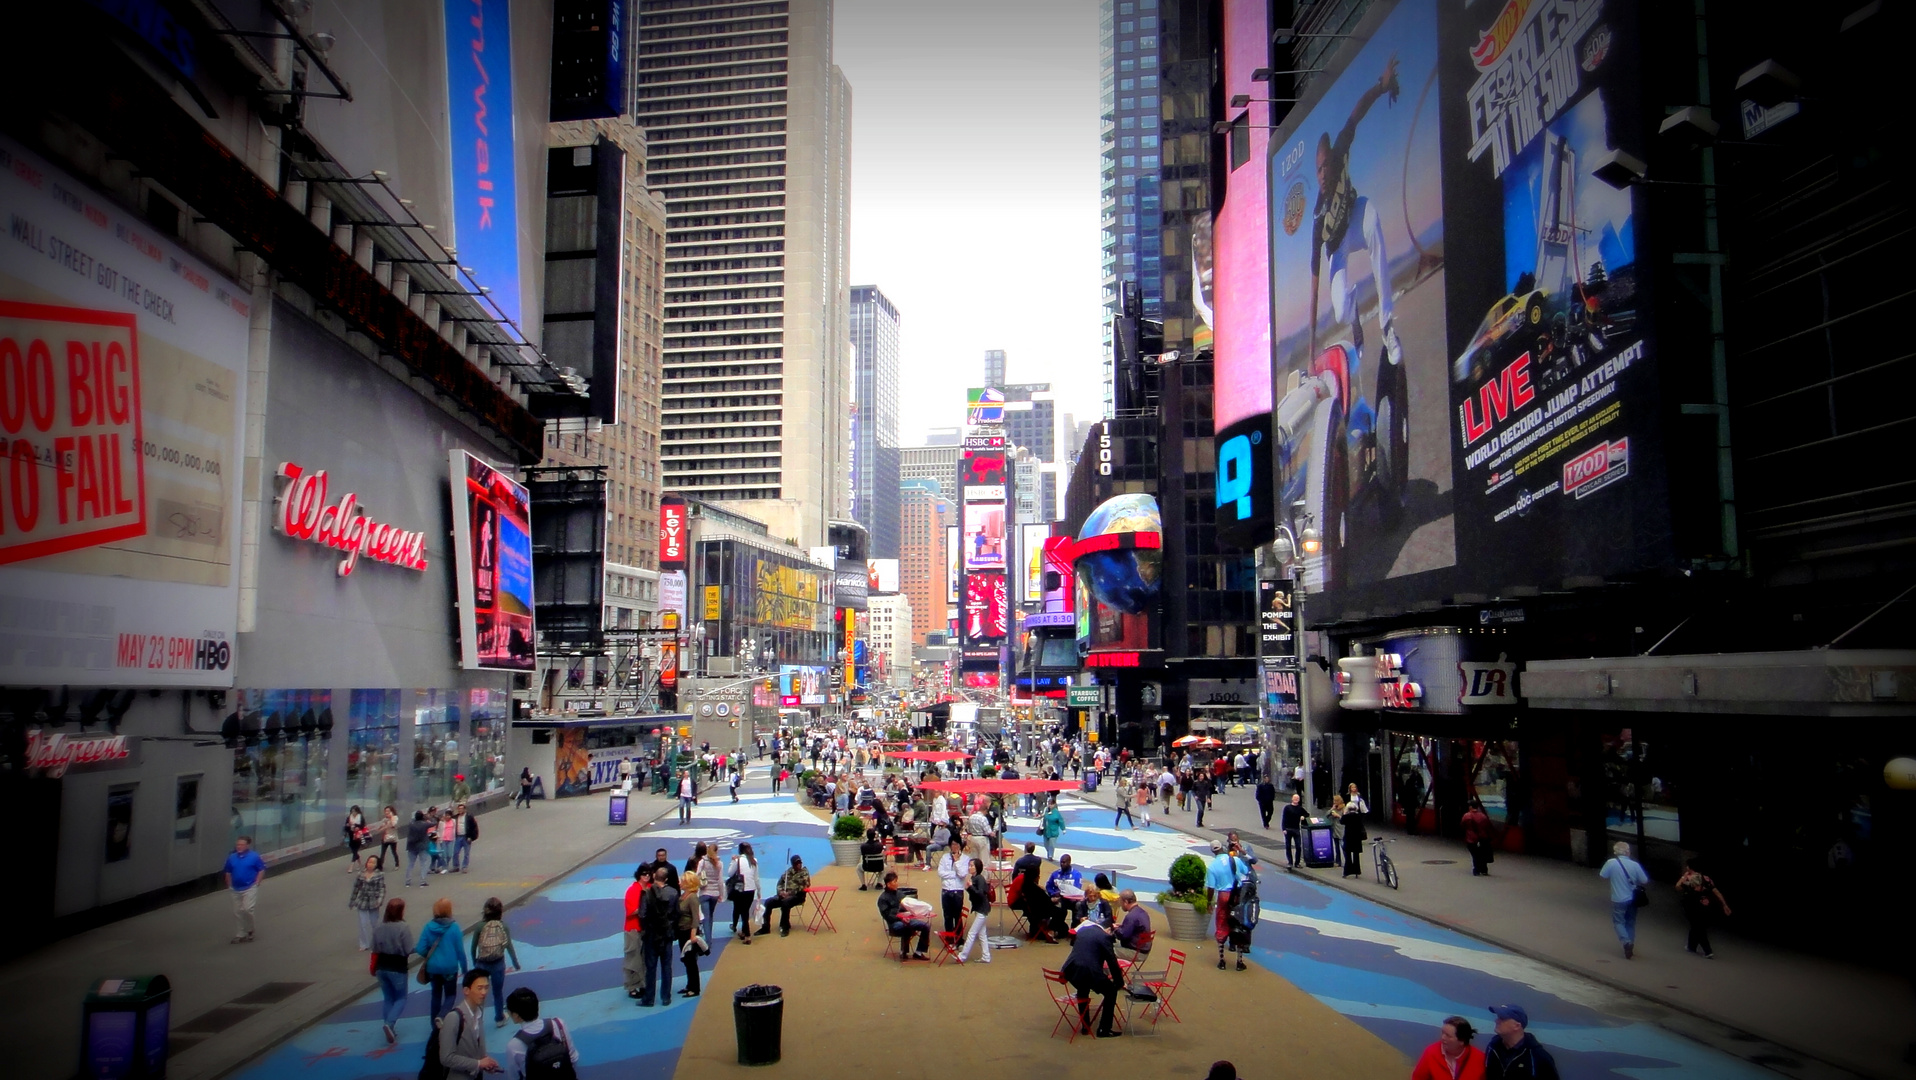 Broadway- Times Square